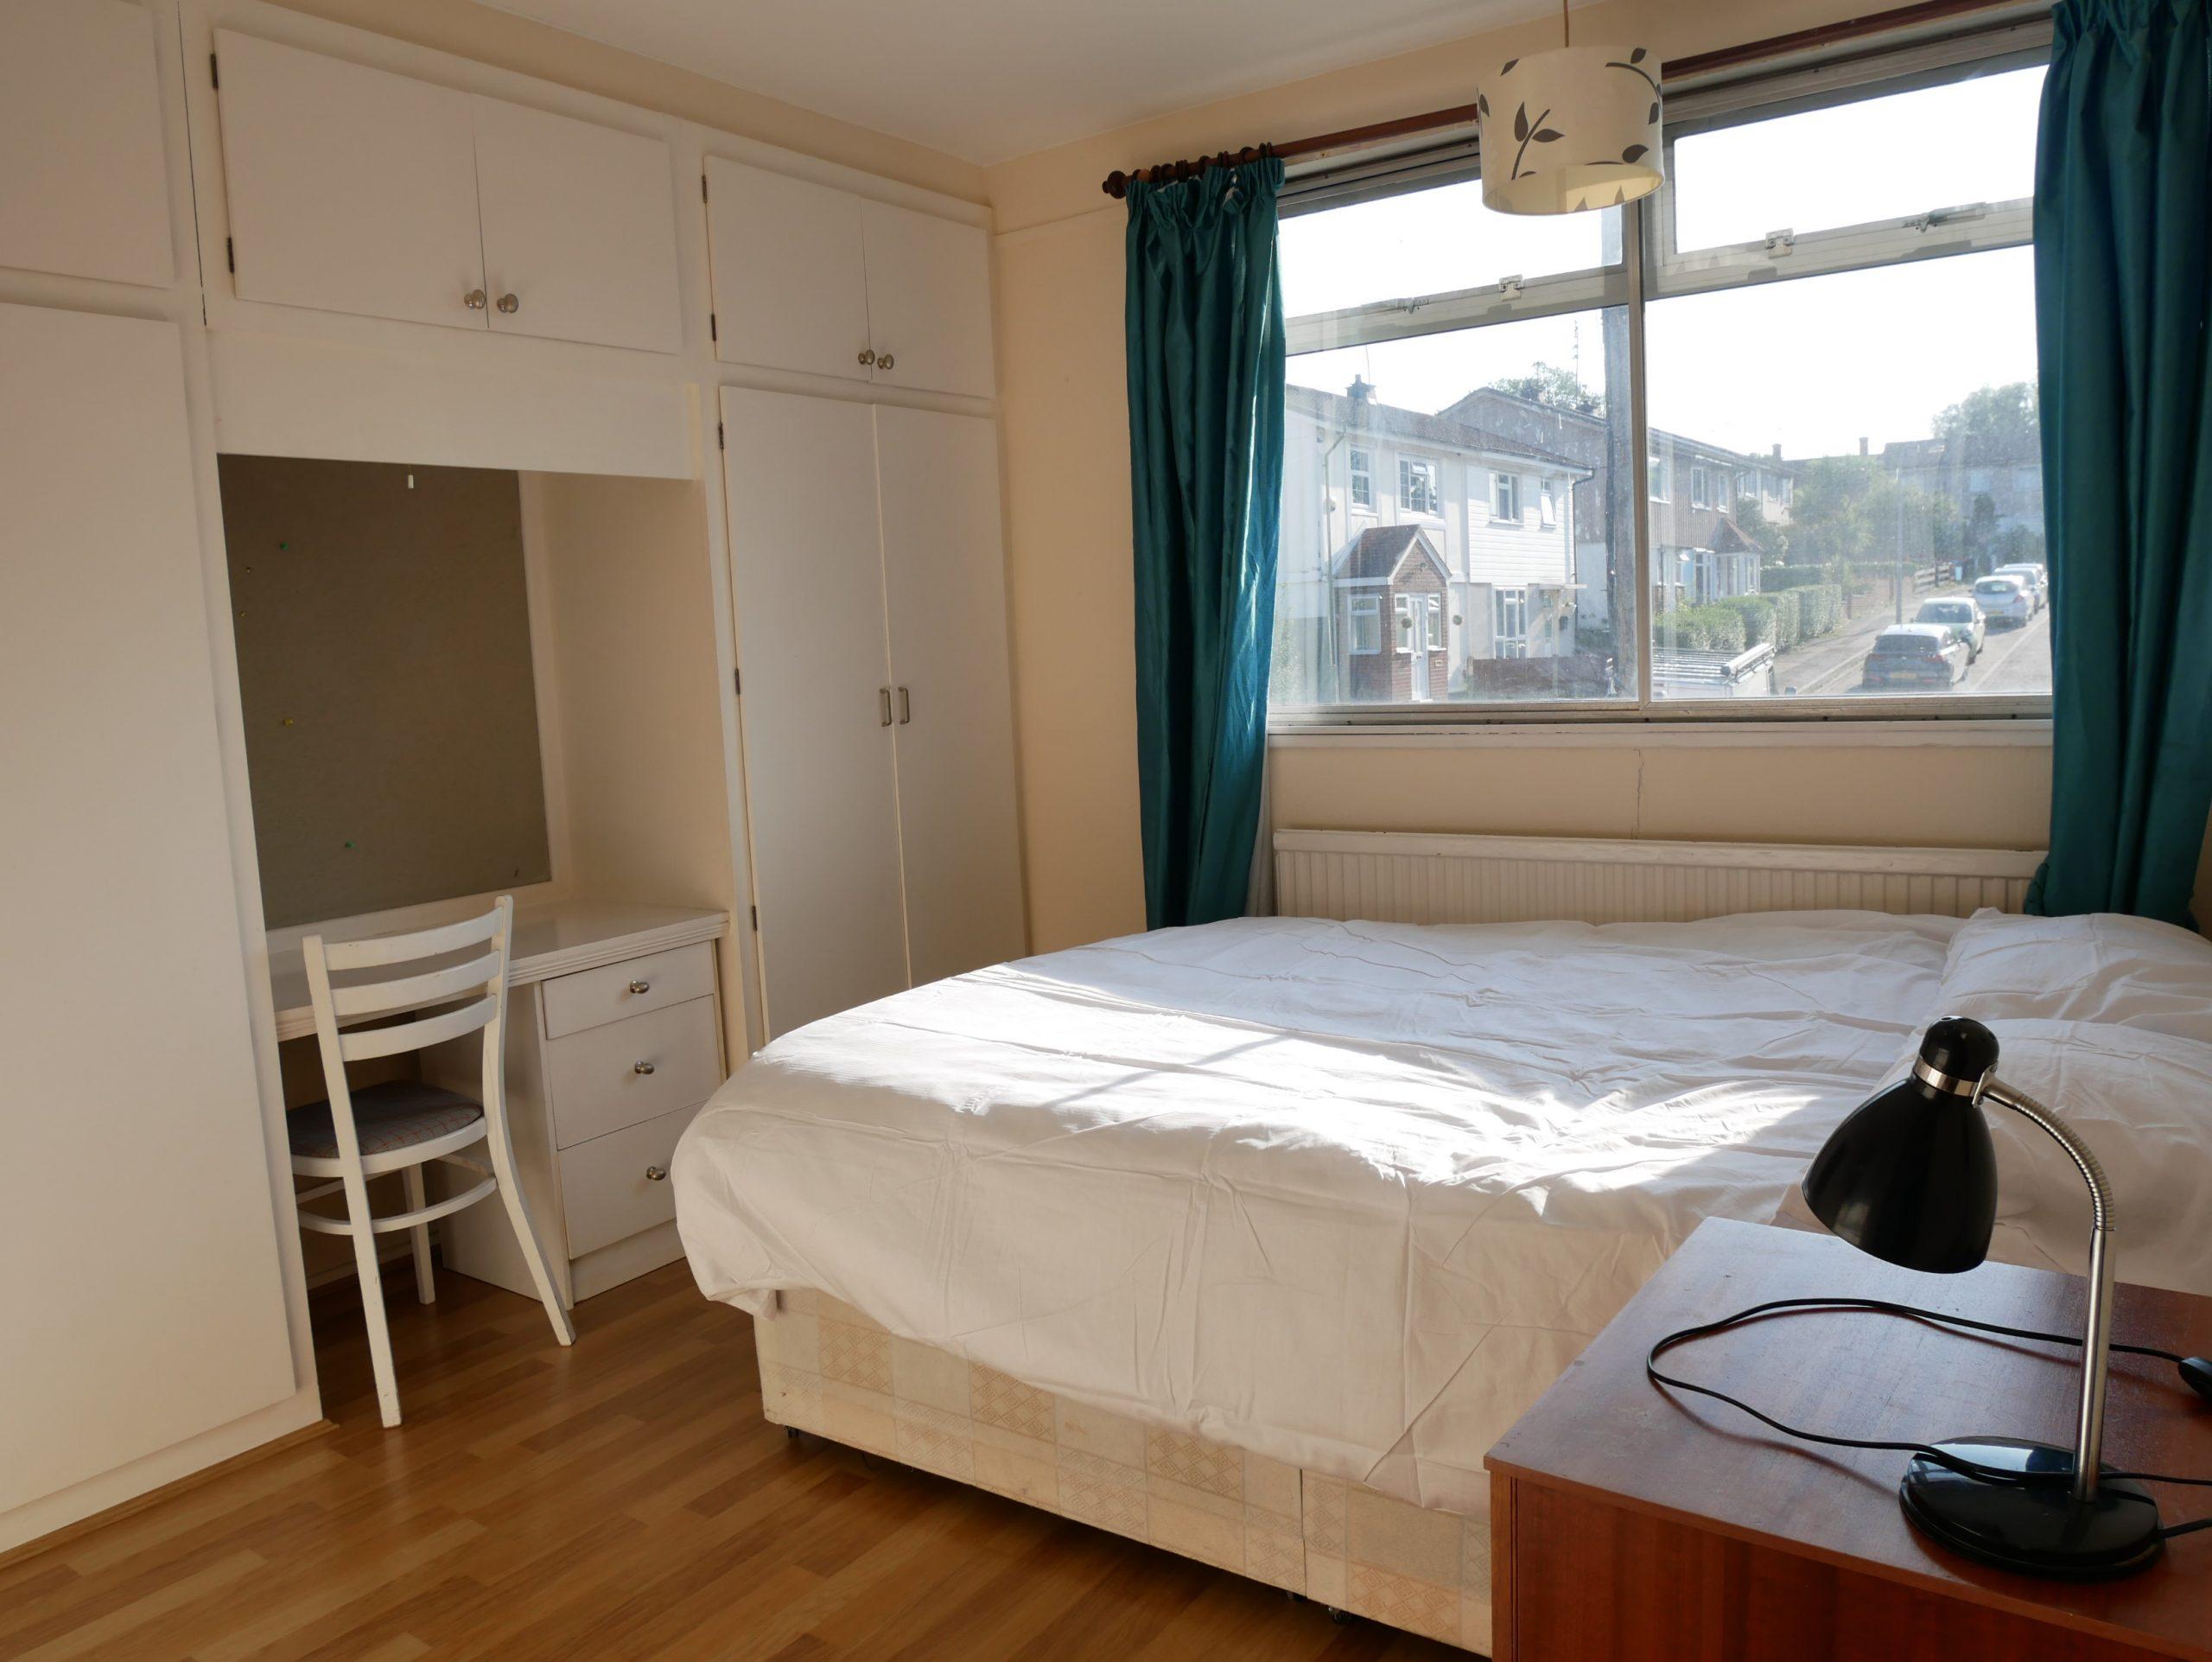 Colebrook Lane #1 – Room 4